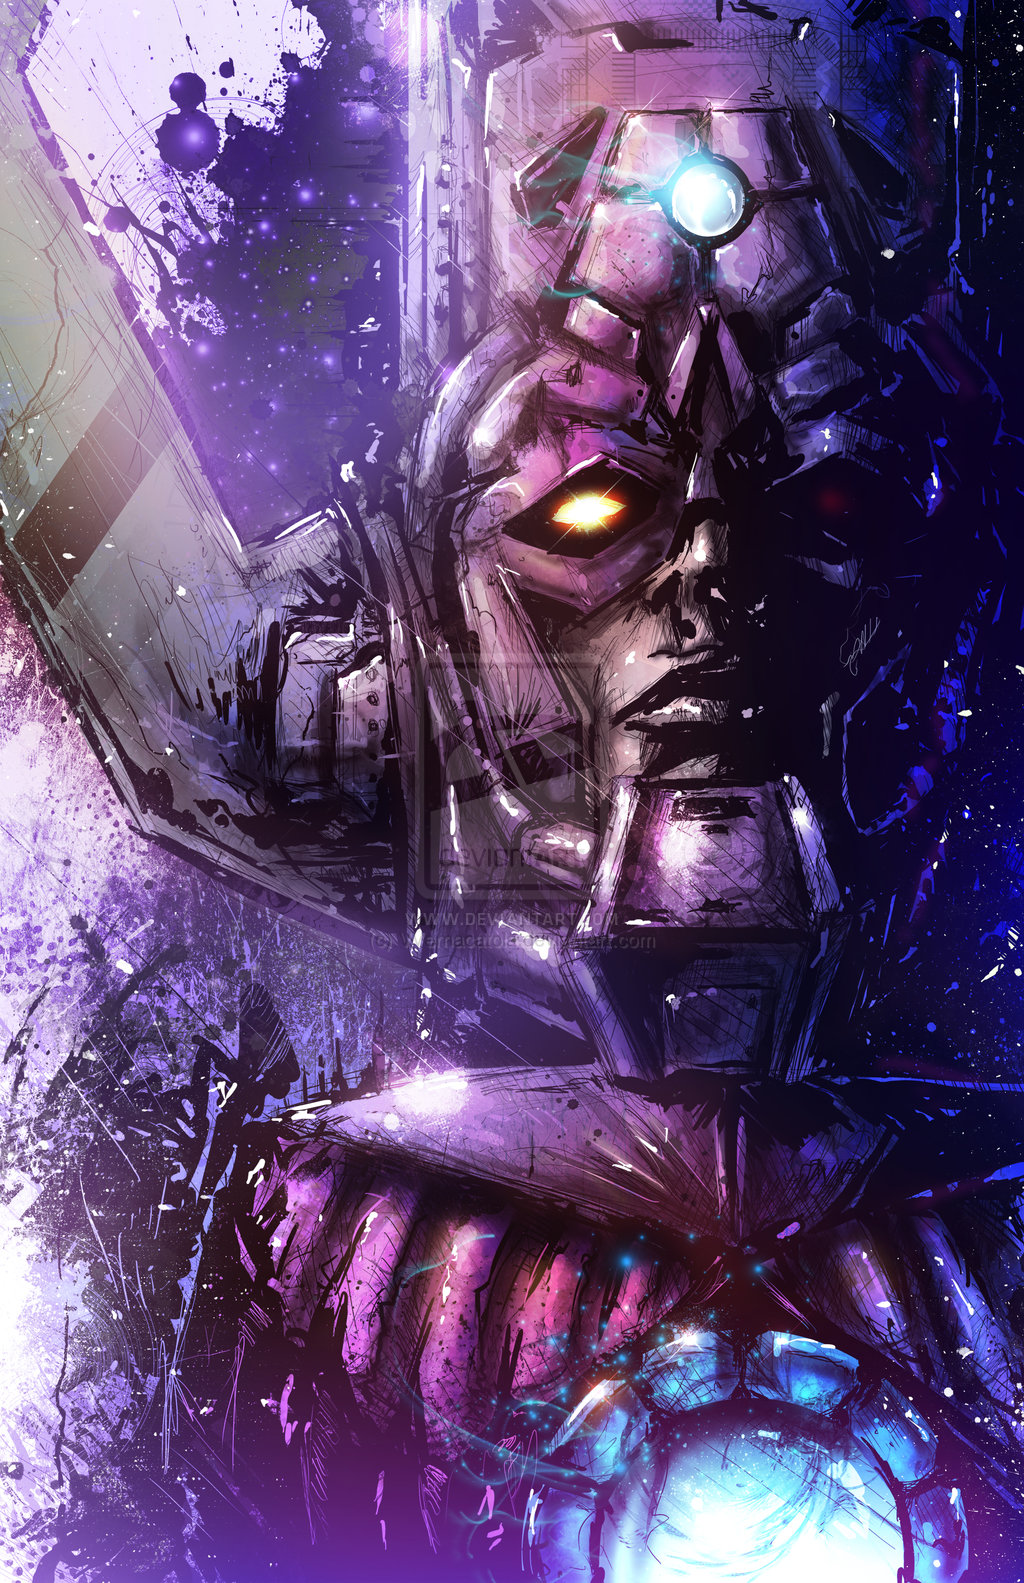 Galactus Wallpaper Galactus by vvernacatola 1024x1583